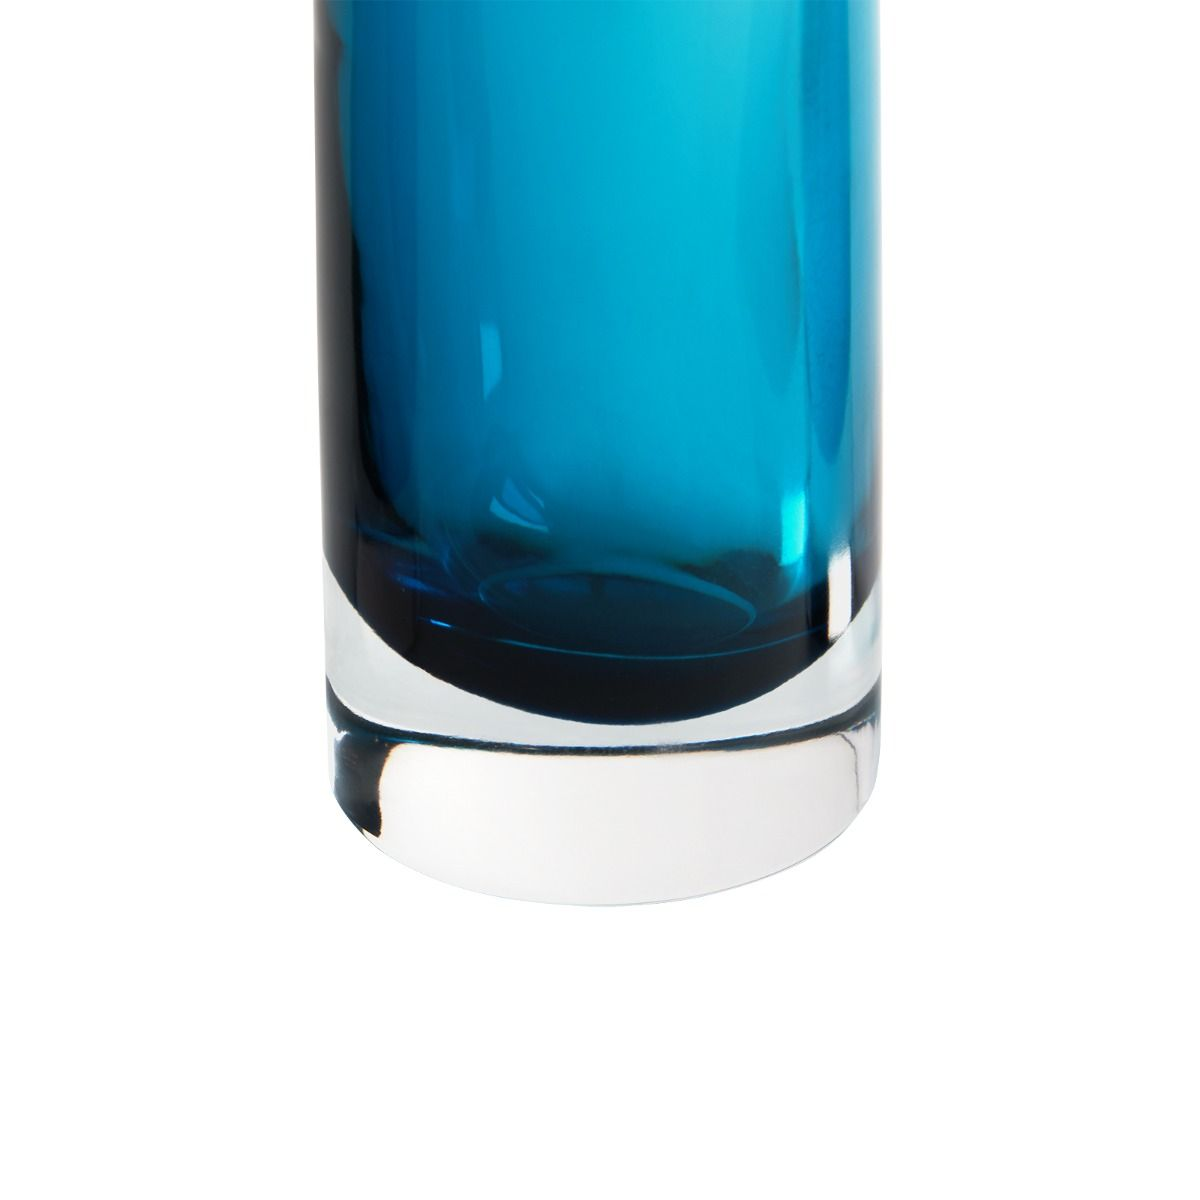 Botella Glass Vases Set | Blue